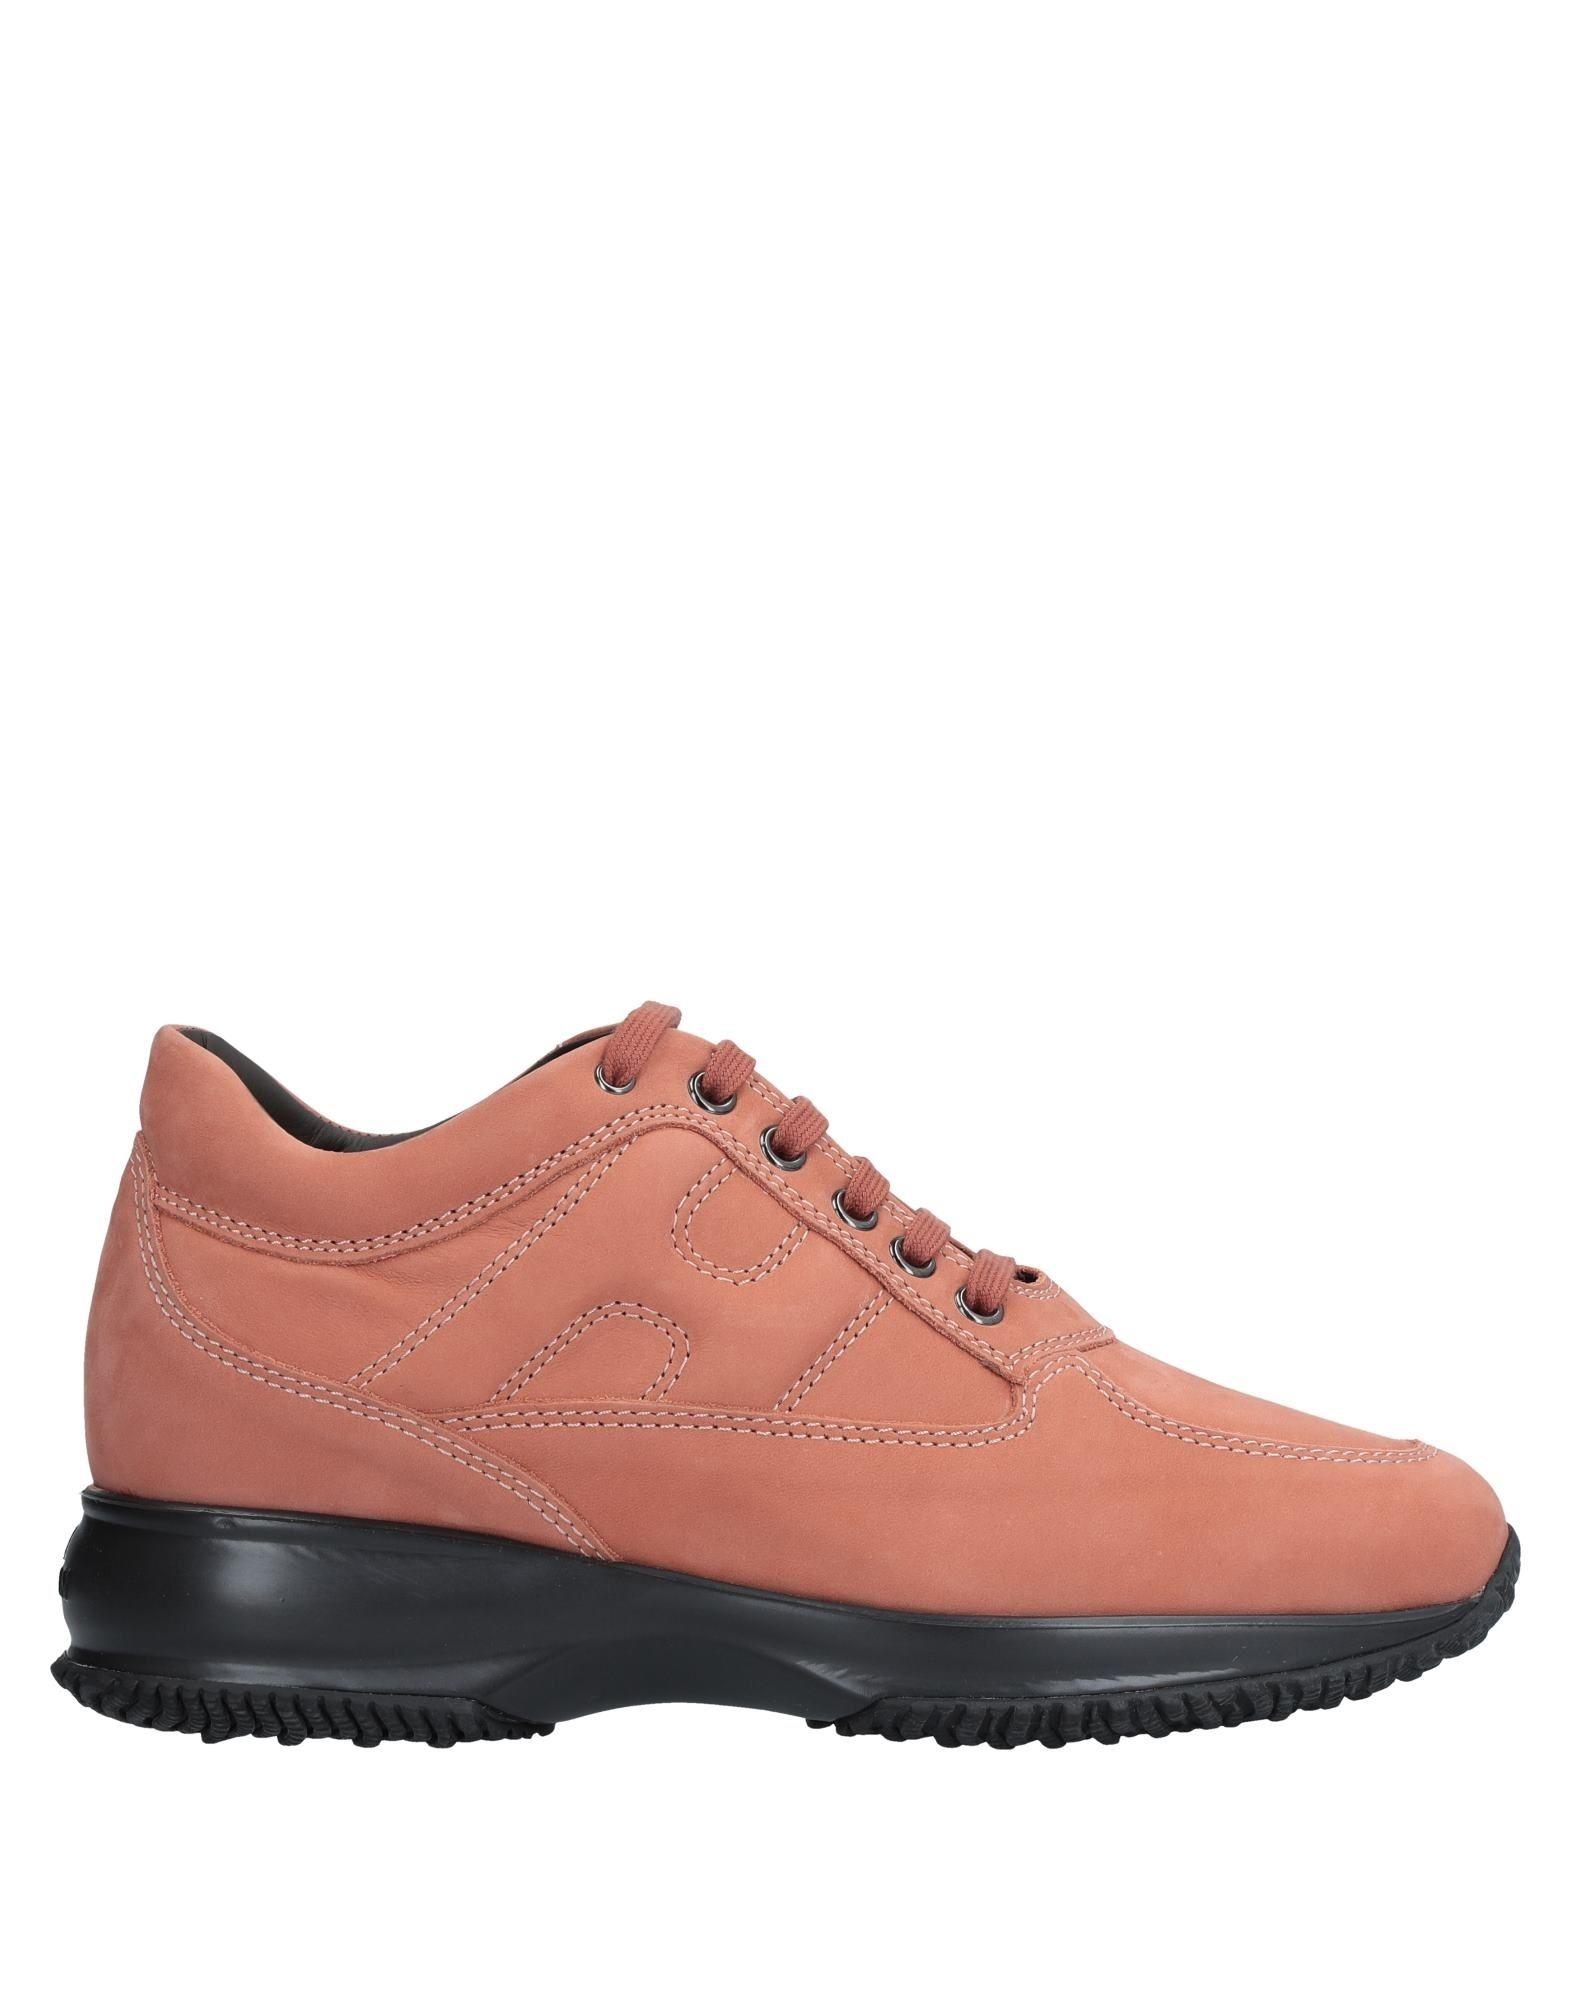 A buon mercato Sneakers Hogan Donna - 11541795GF